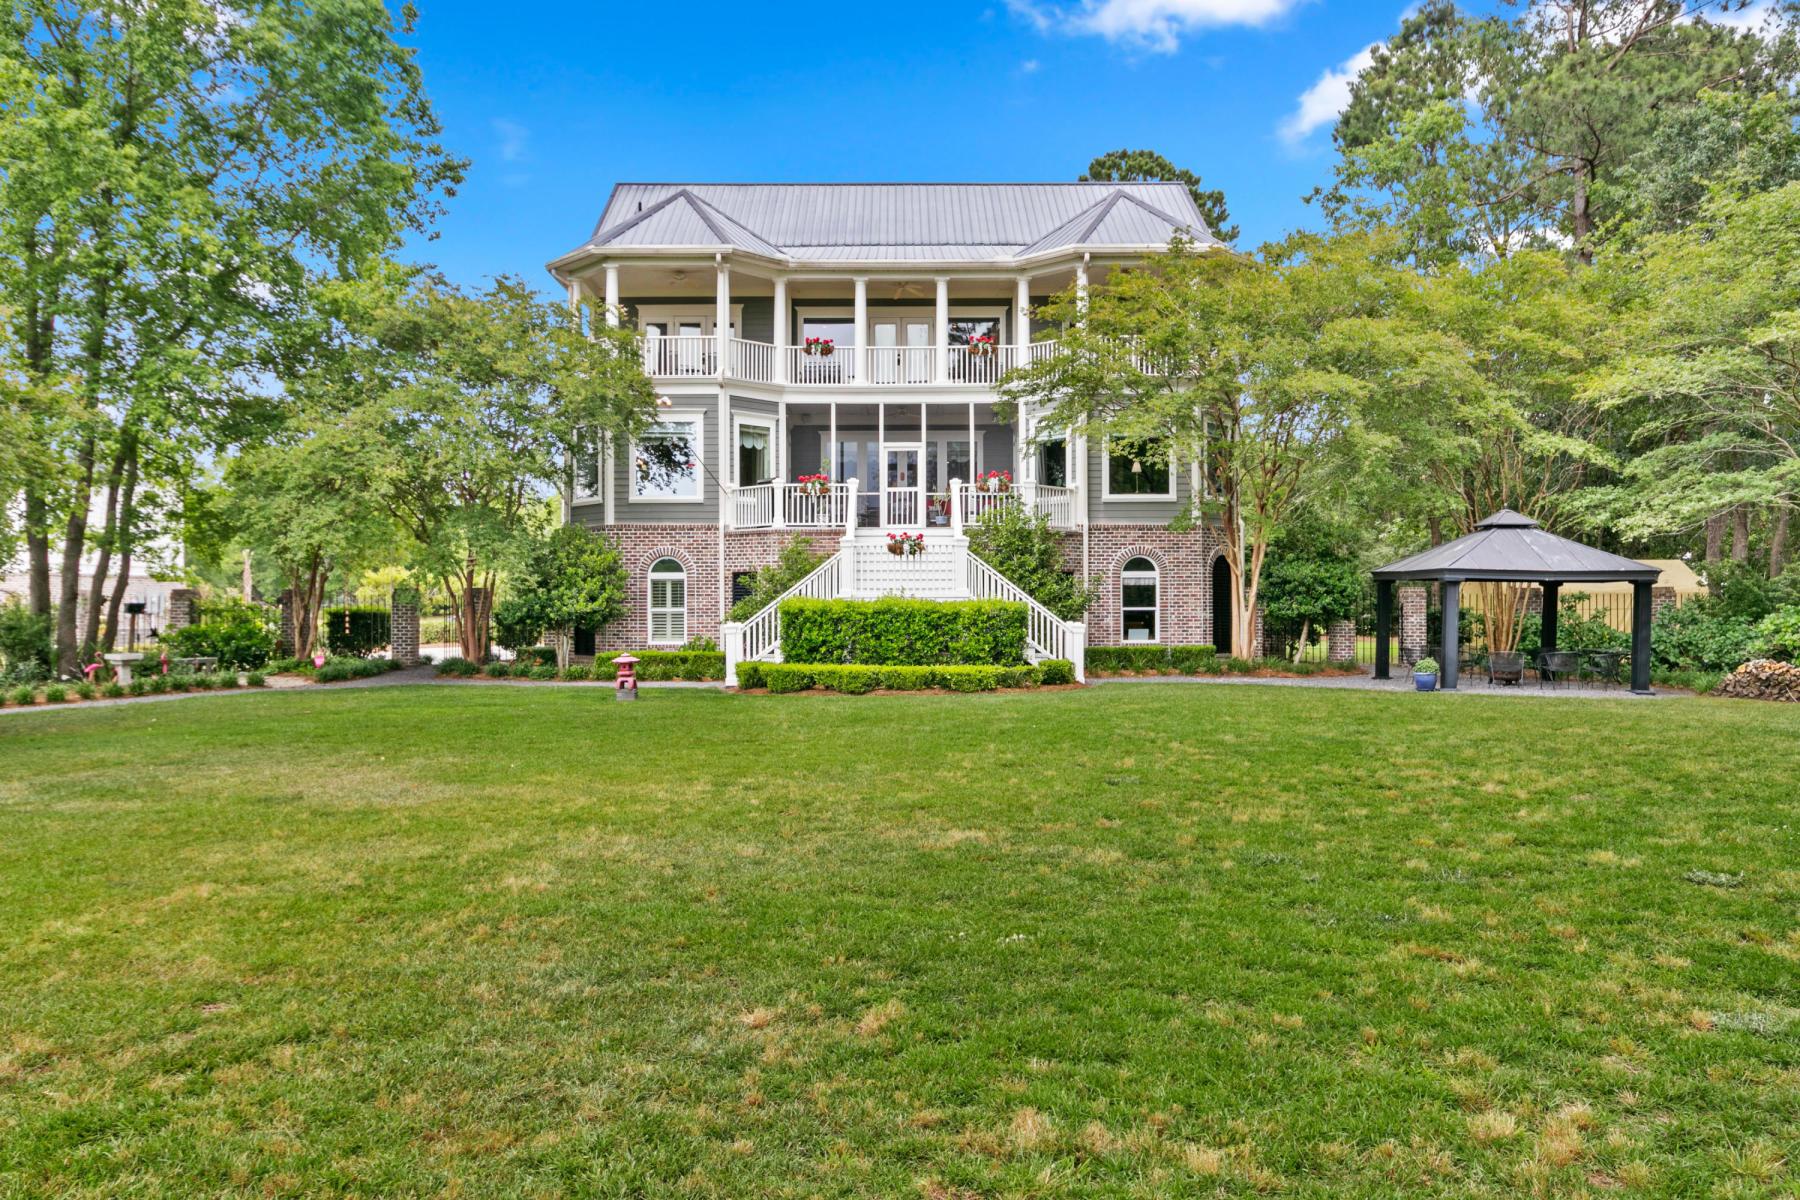 Broughton Hall Homes For Sale - 2058 Lakeshore, Pinopolis, SC - 53